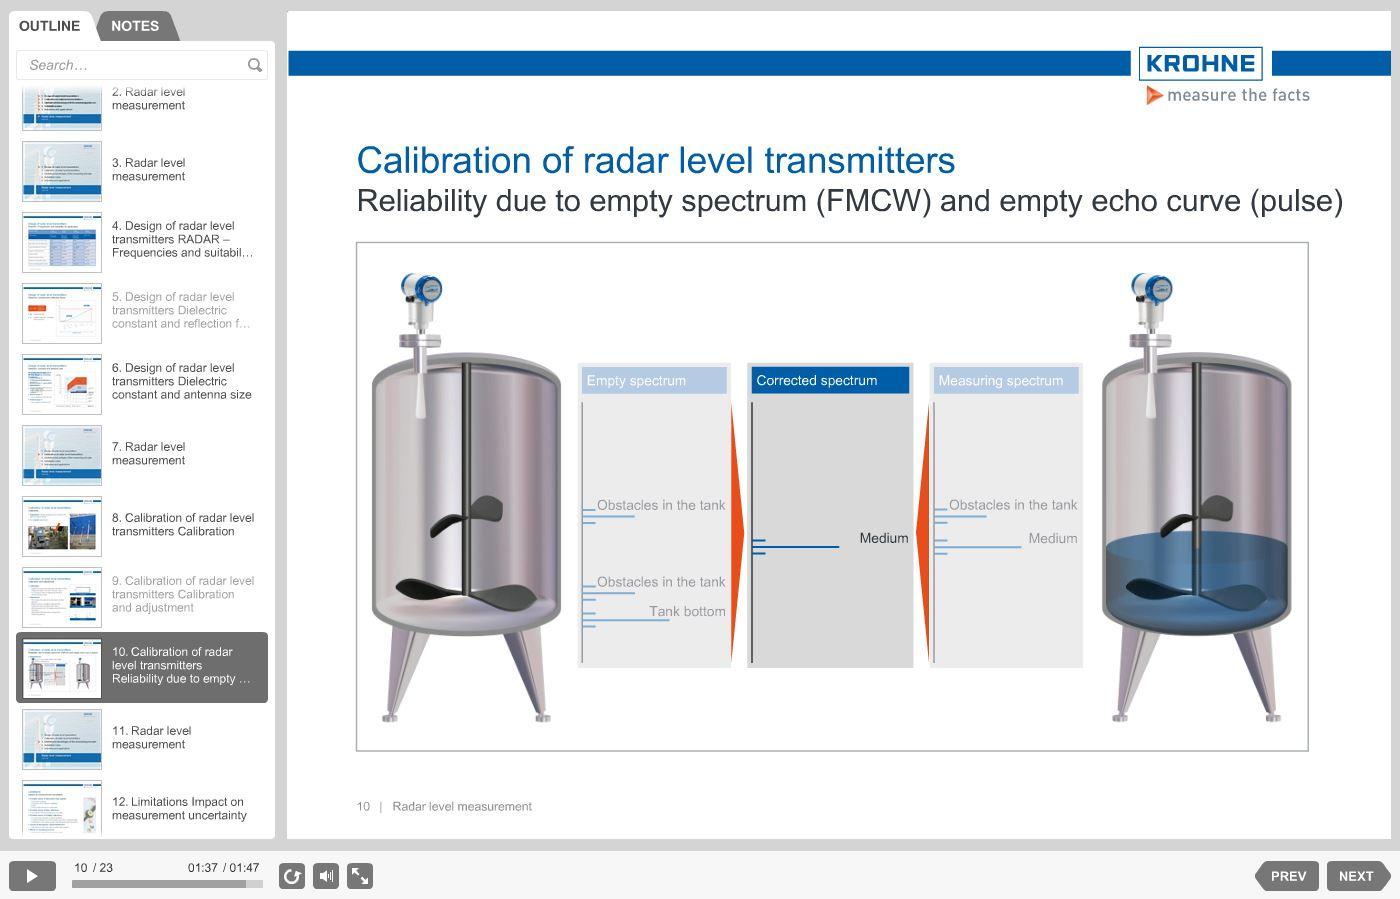 eLearning FMCW Radar Level Measurement – Calibration